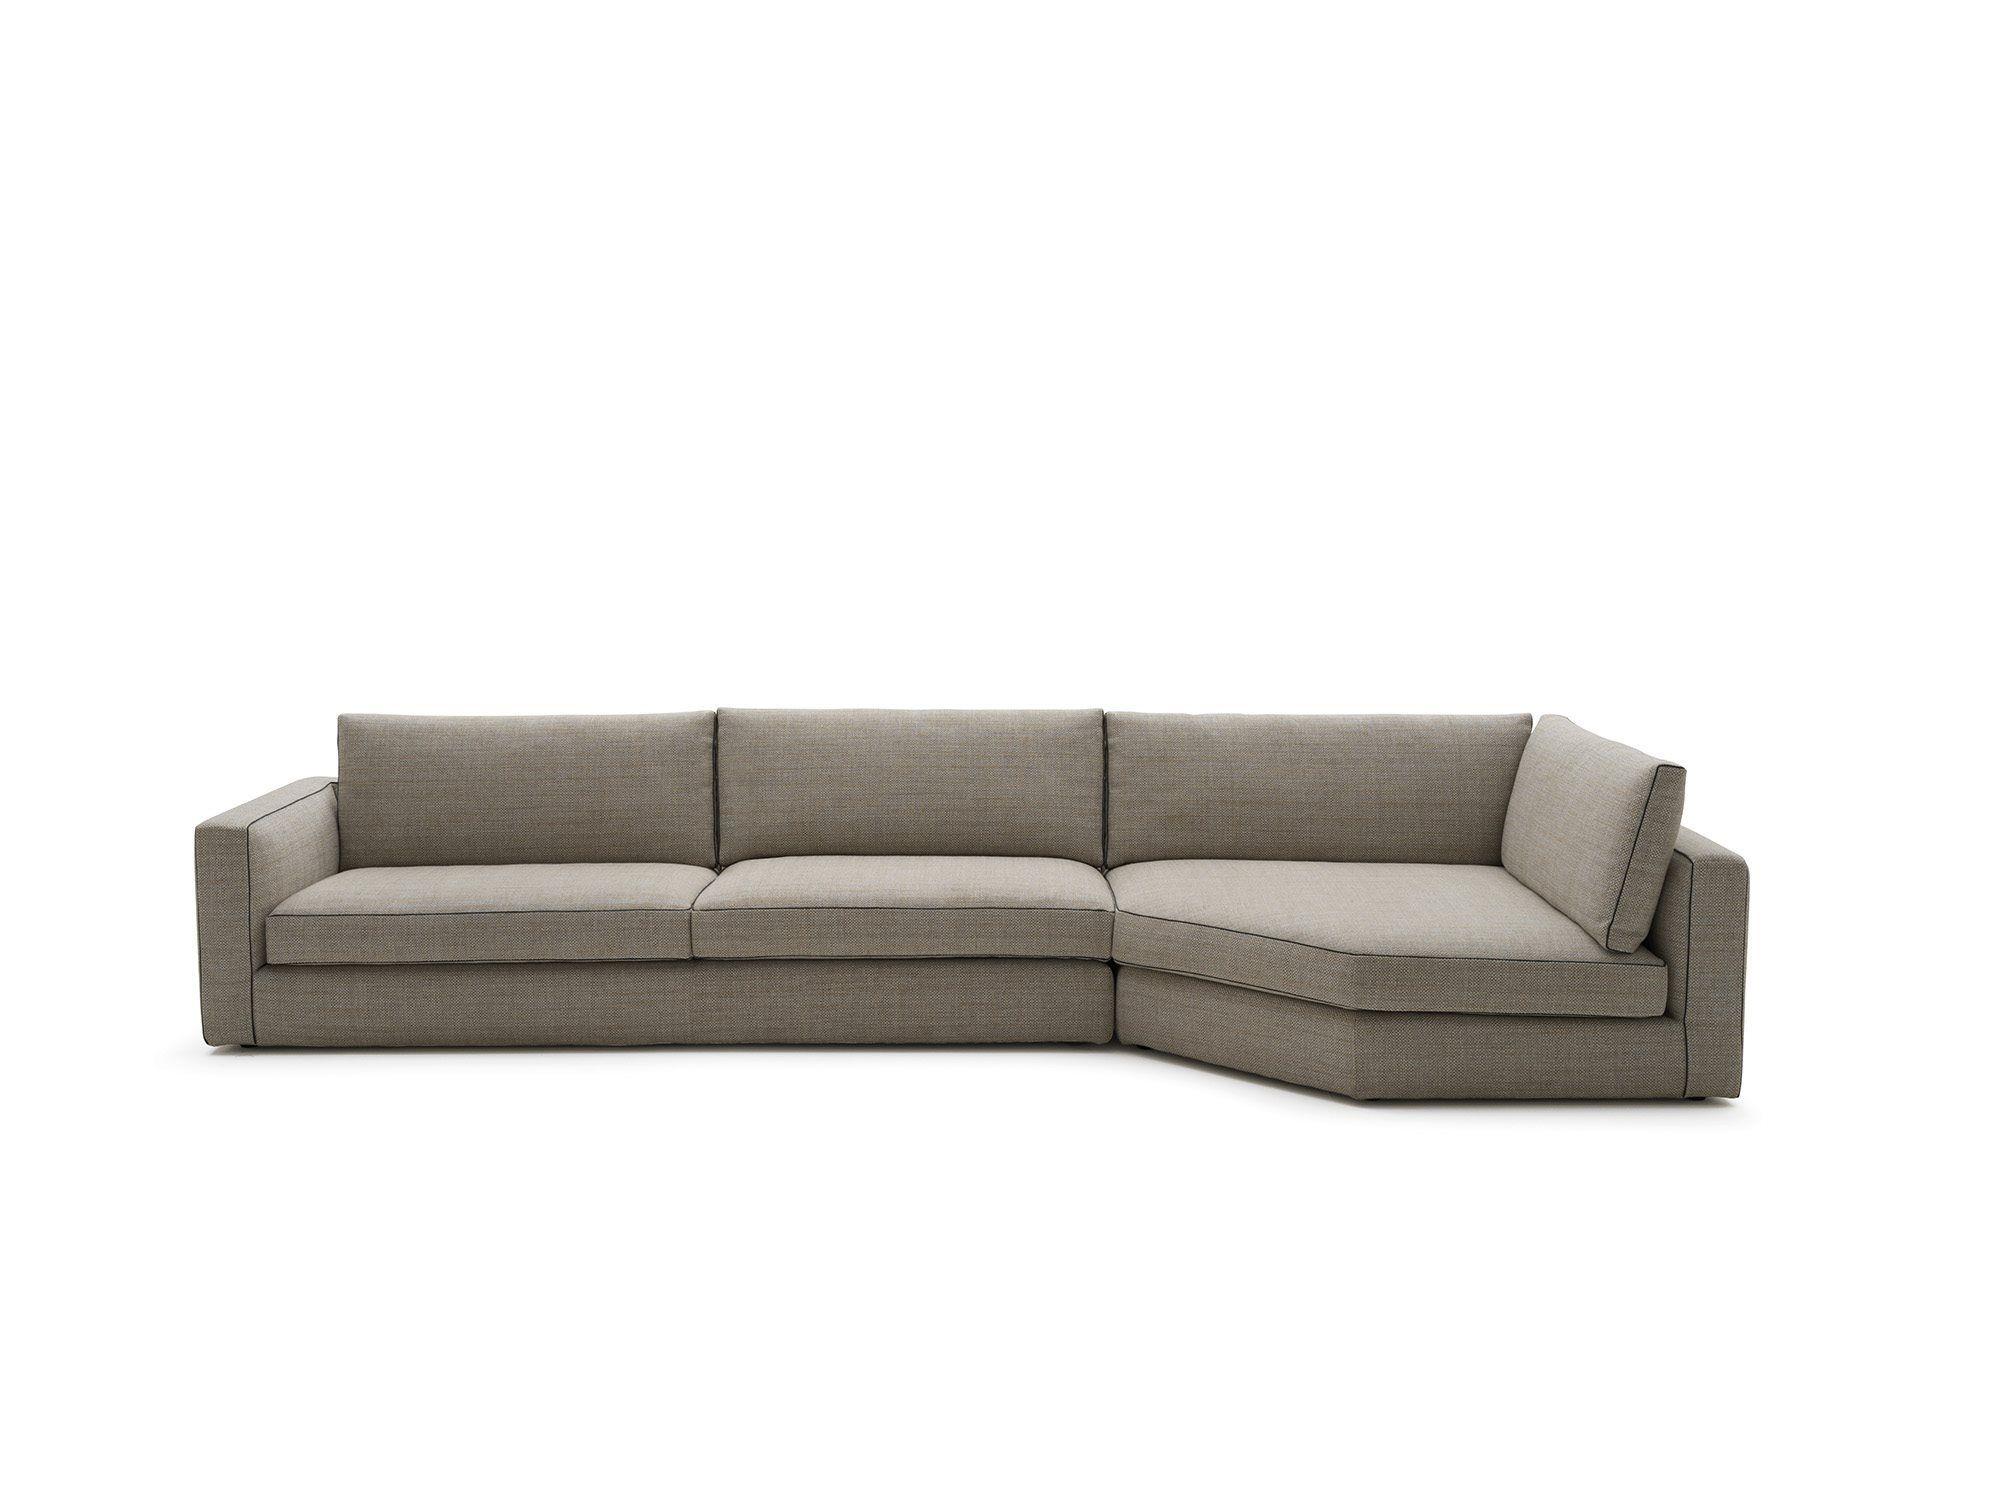 Laguna Sofa Sofa Large Cushions Sectional Couch